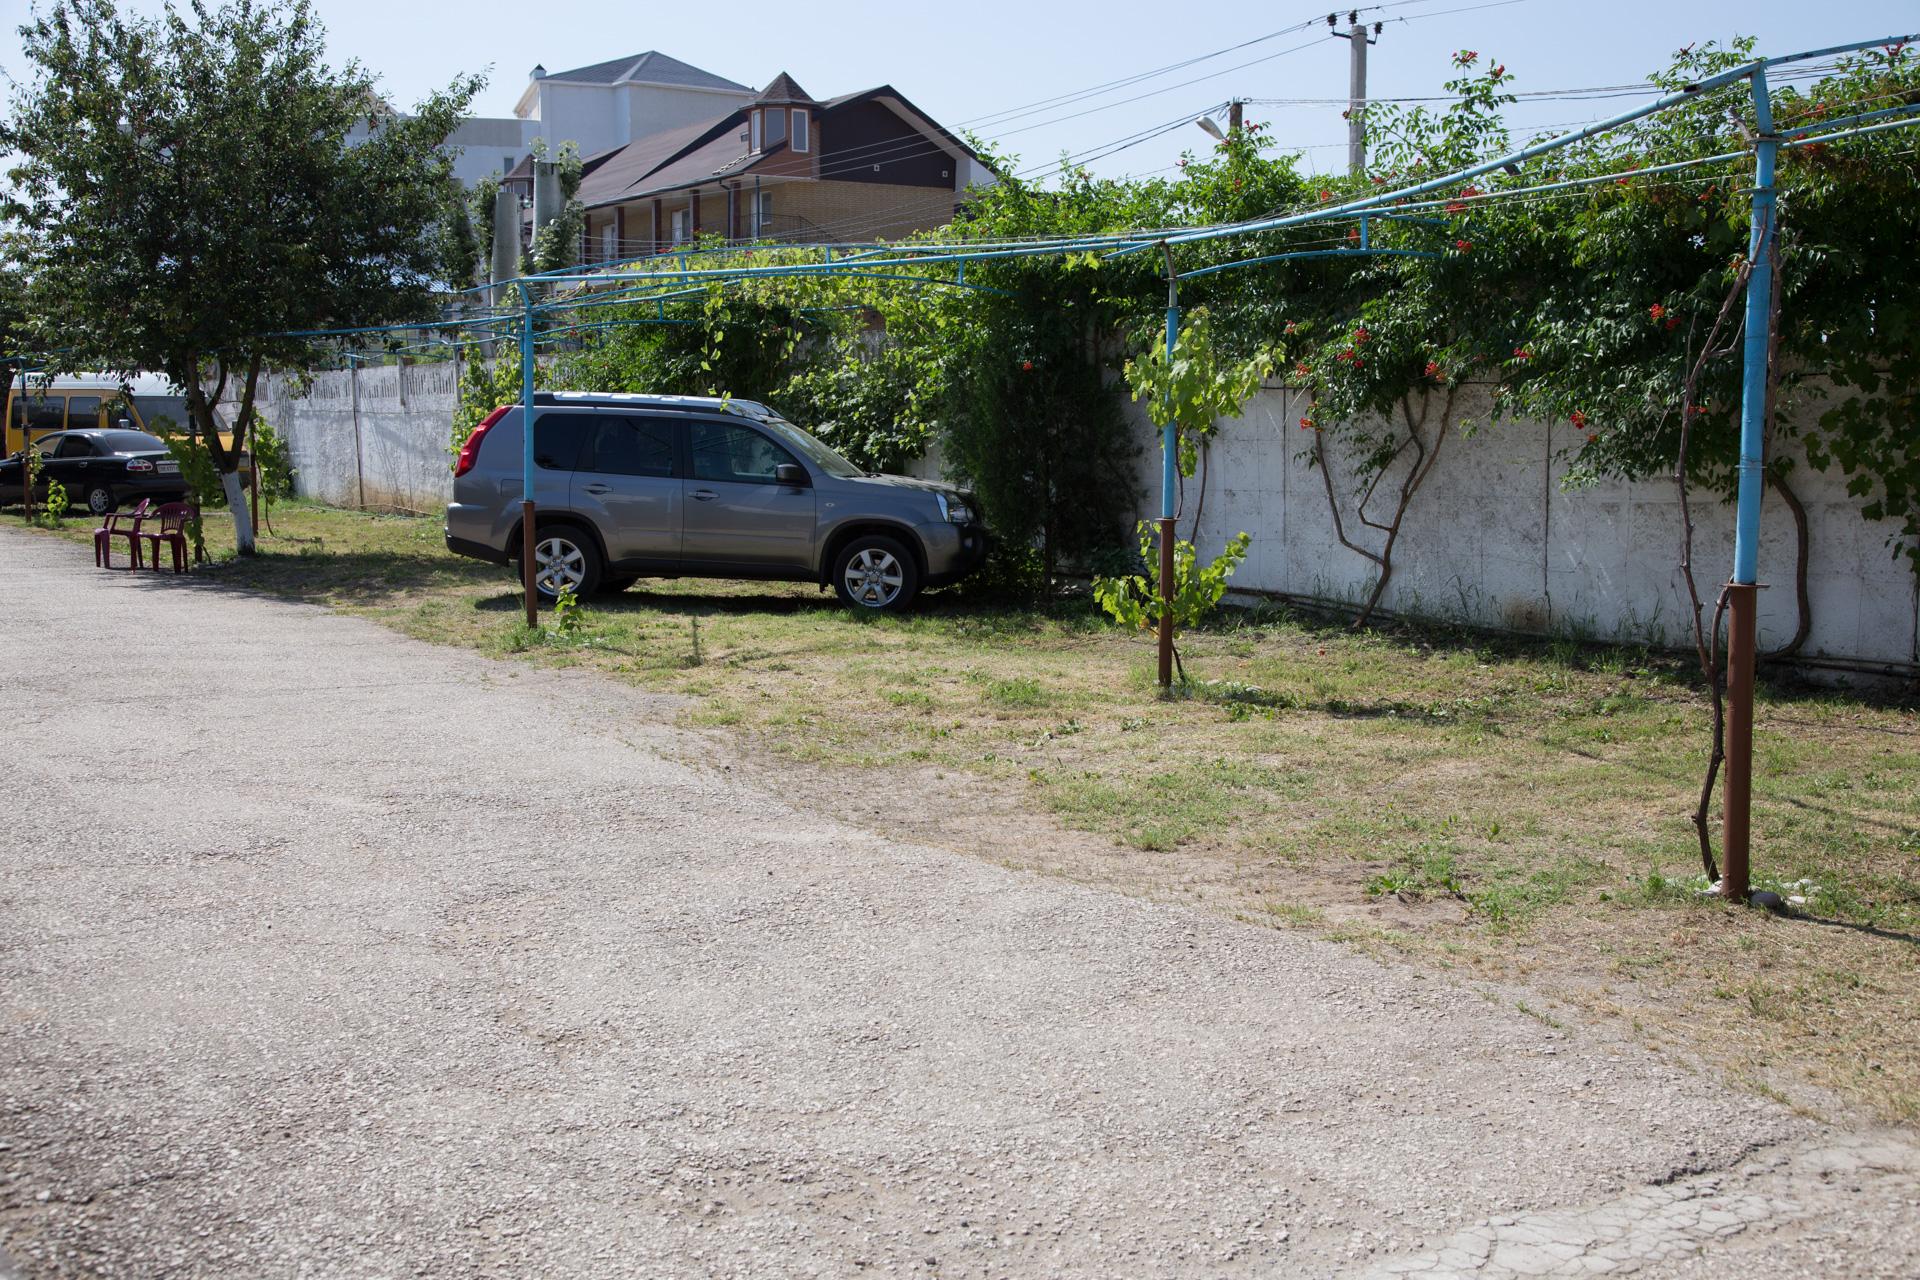 Парковка для машин на базе отдыха Альтернатива, Крым, Феодосия